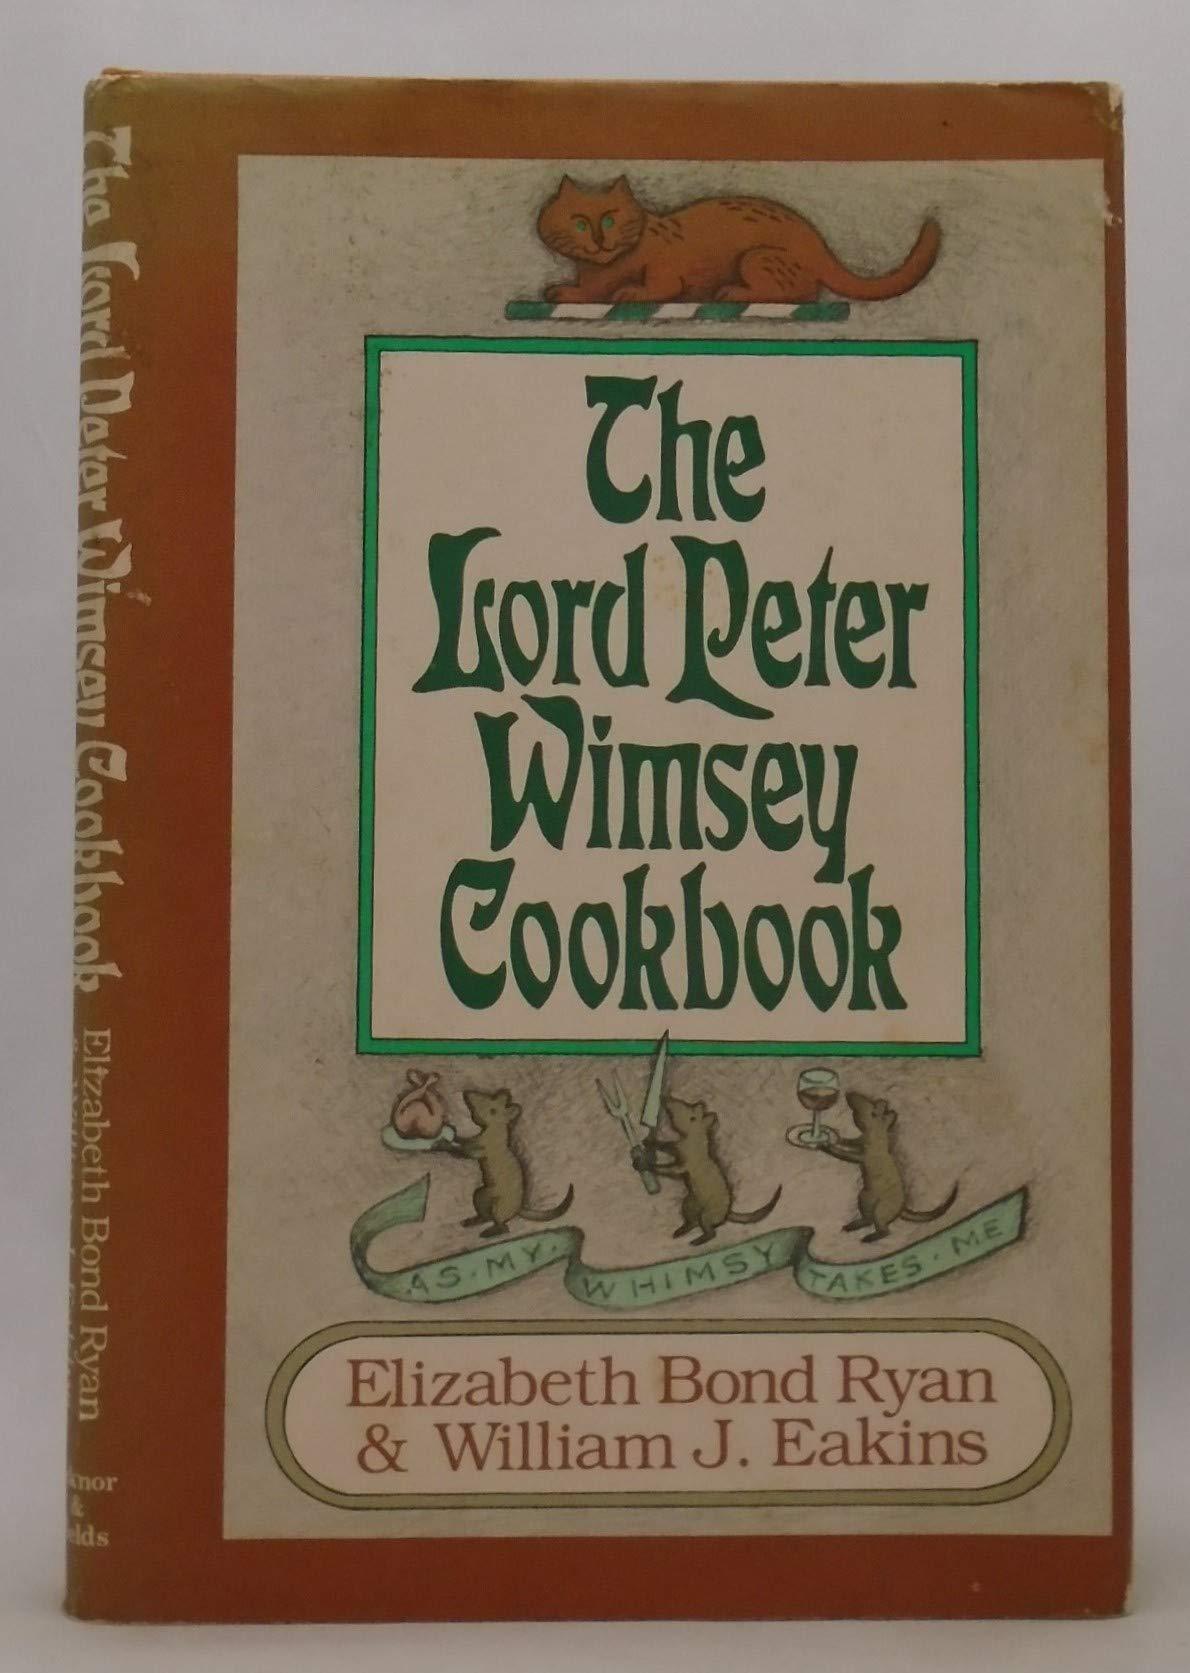 The Lord Peter Wimsey Cookbook, William J. Eakins; Elizabeth Bond Ryan